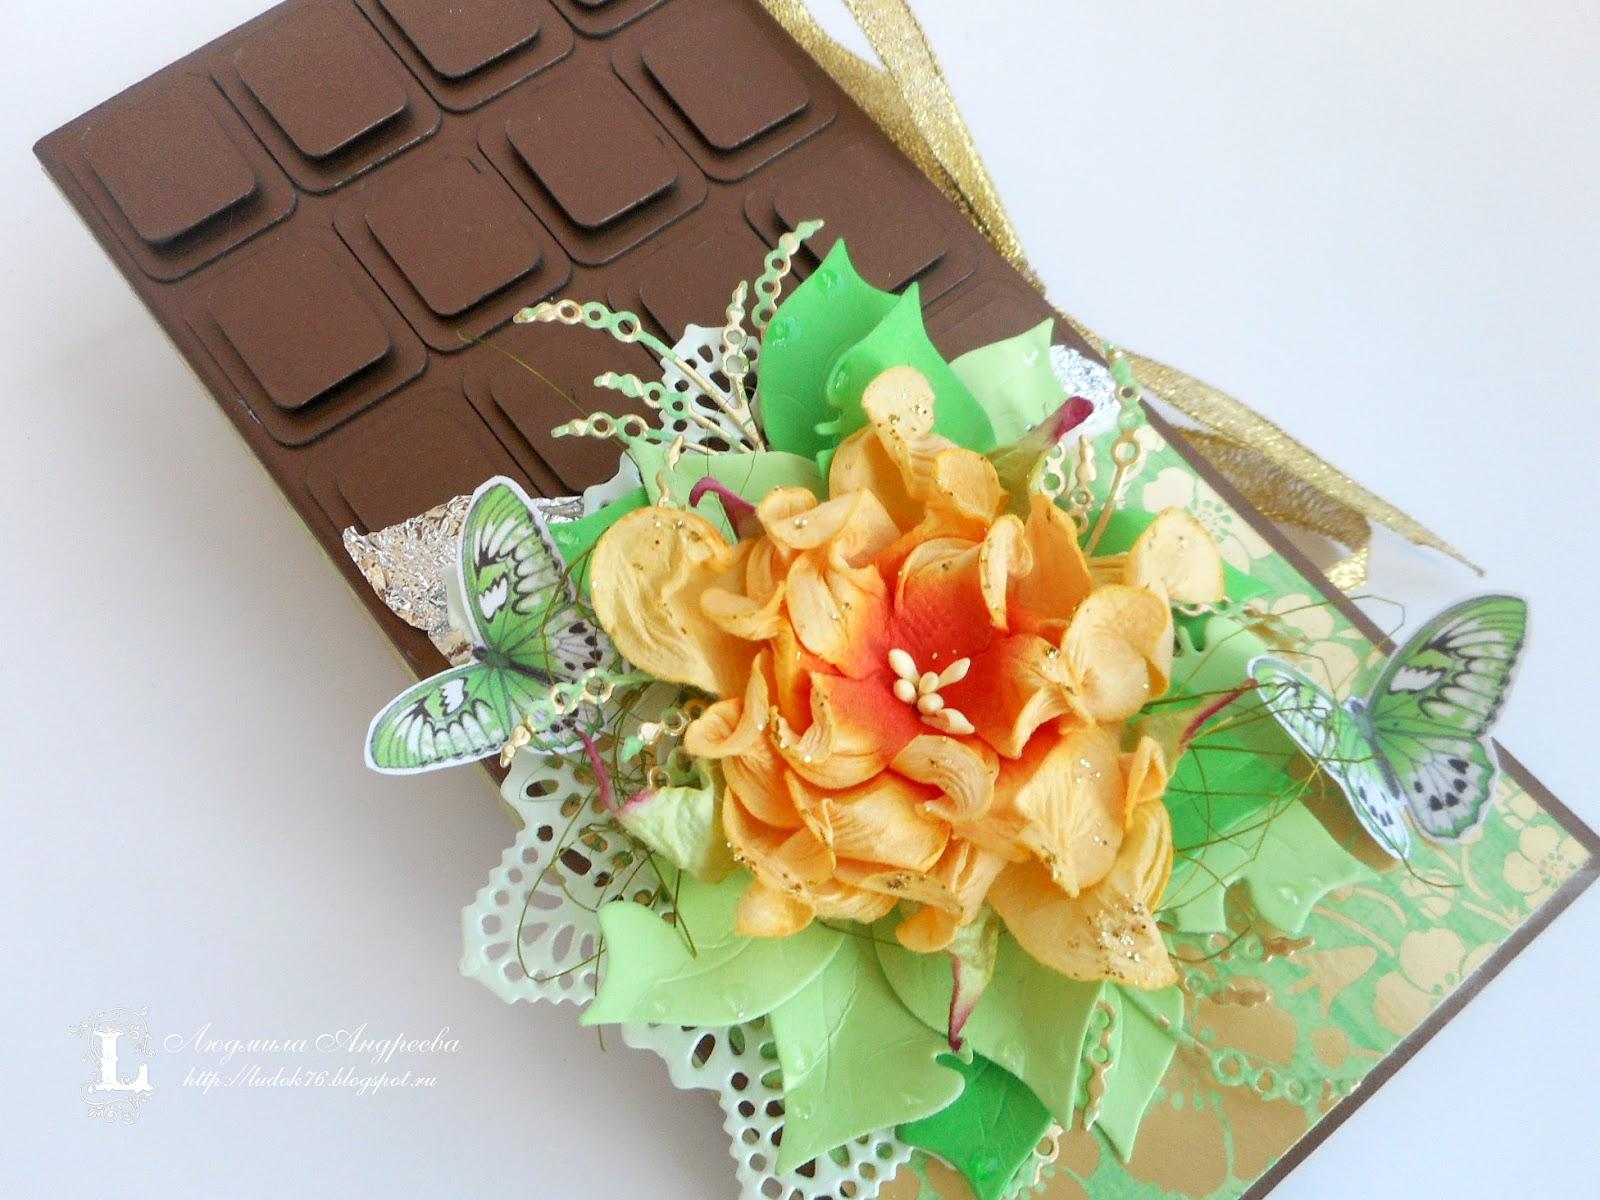 вовсе открытка плитка шоколада поздравляли